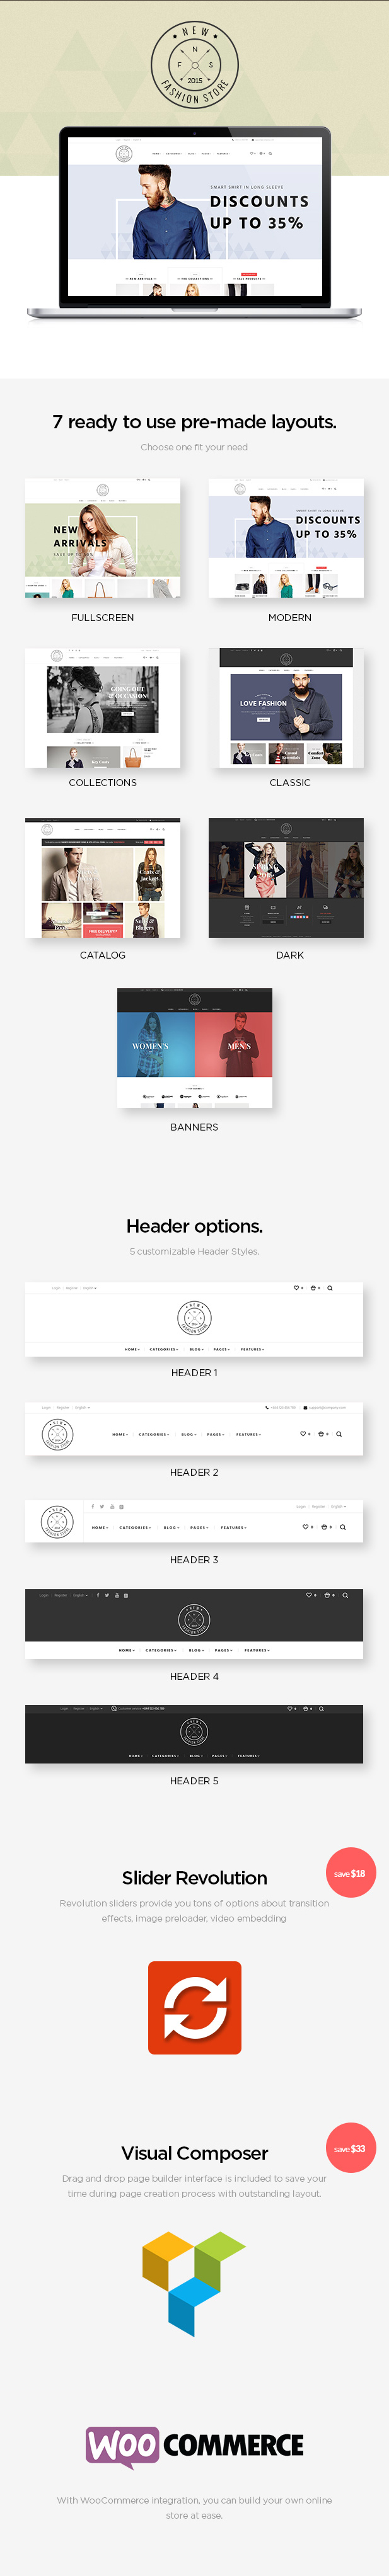 NewFashion - Modern WooCommerce WordPress Theme - 5